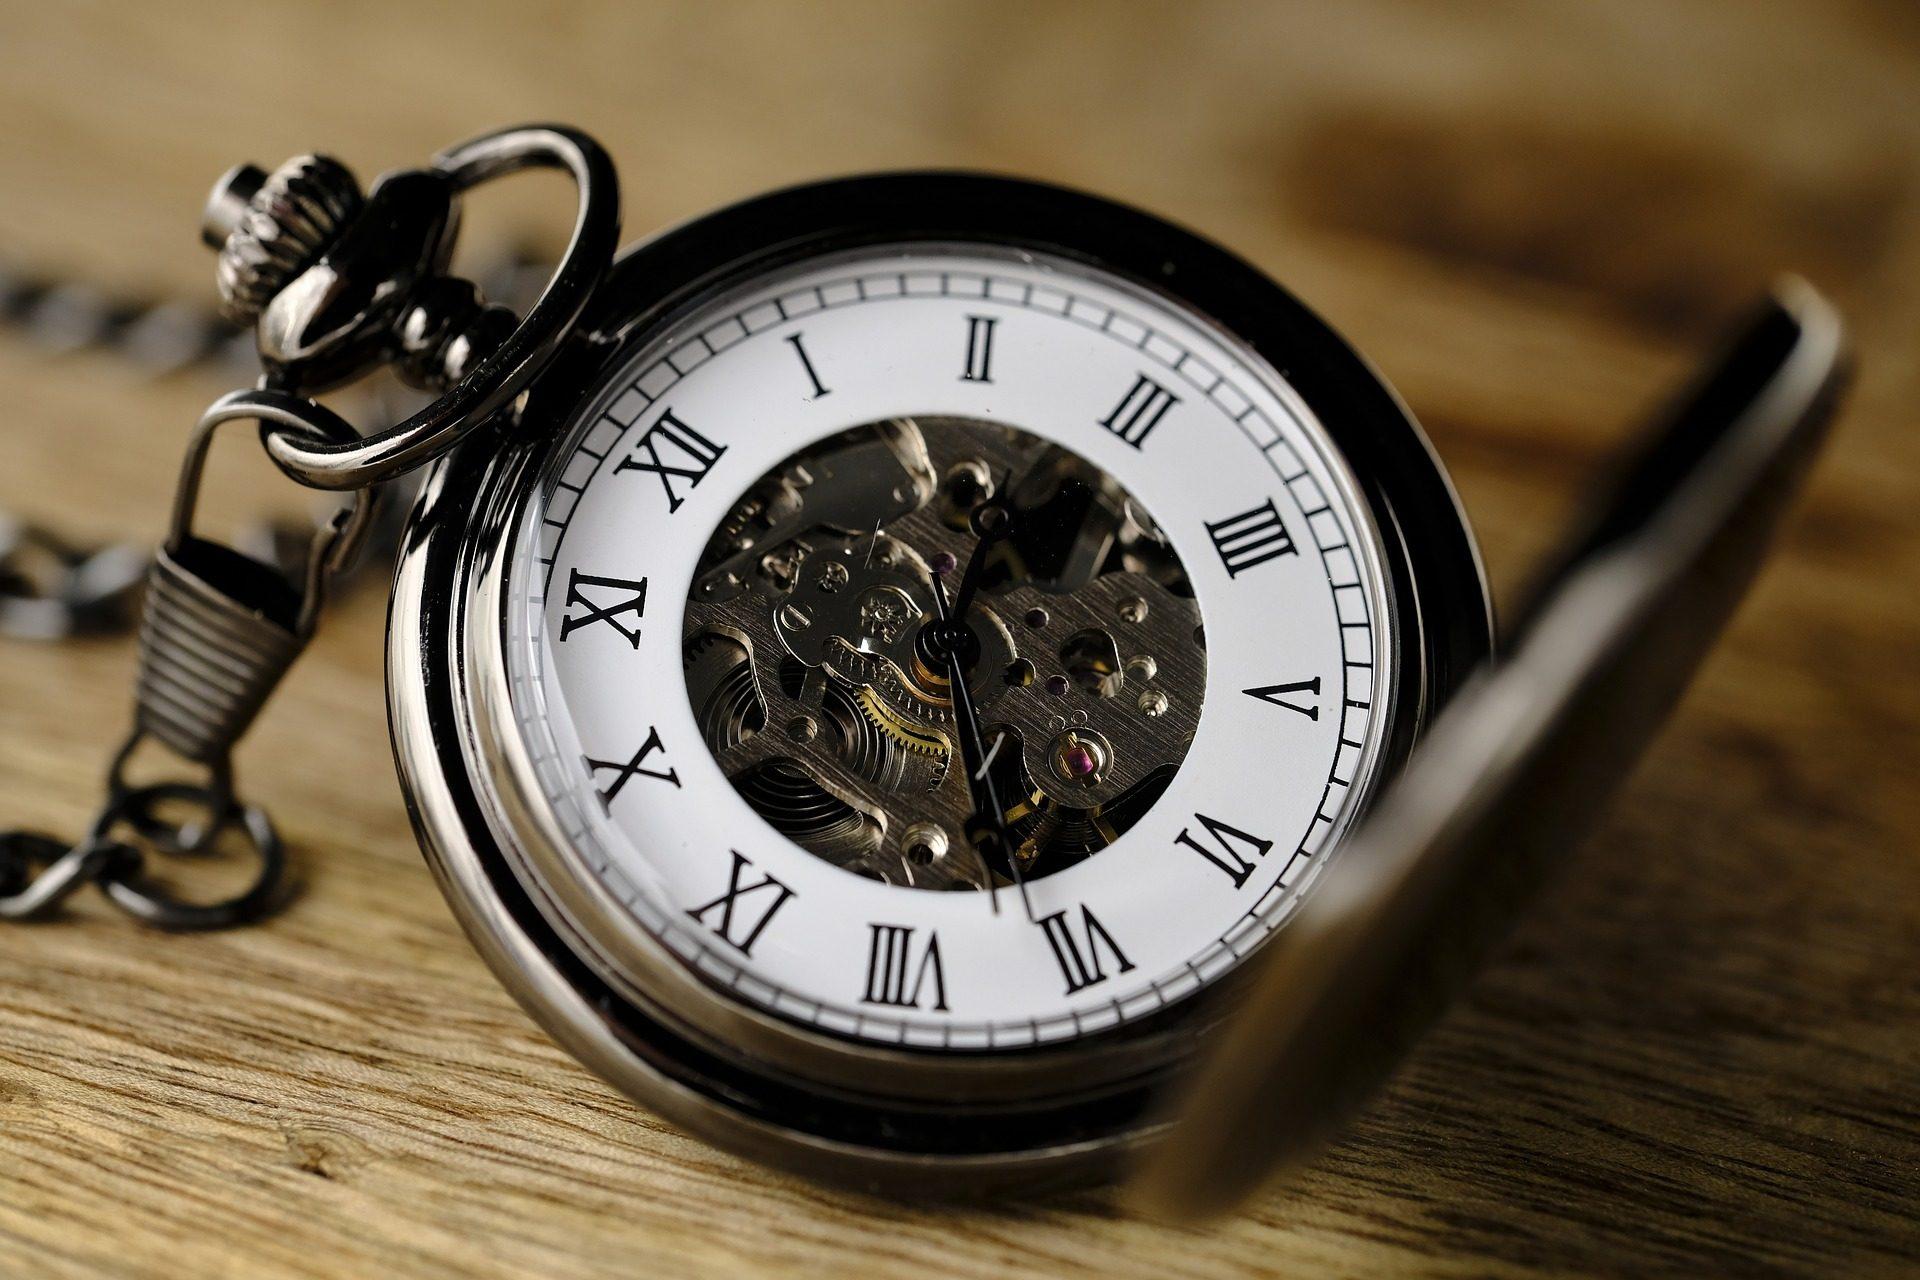 Orologio, vecchio, vintage, meccanismi, Ingranaggi - Sfondi HD - Professor-falken.com